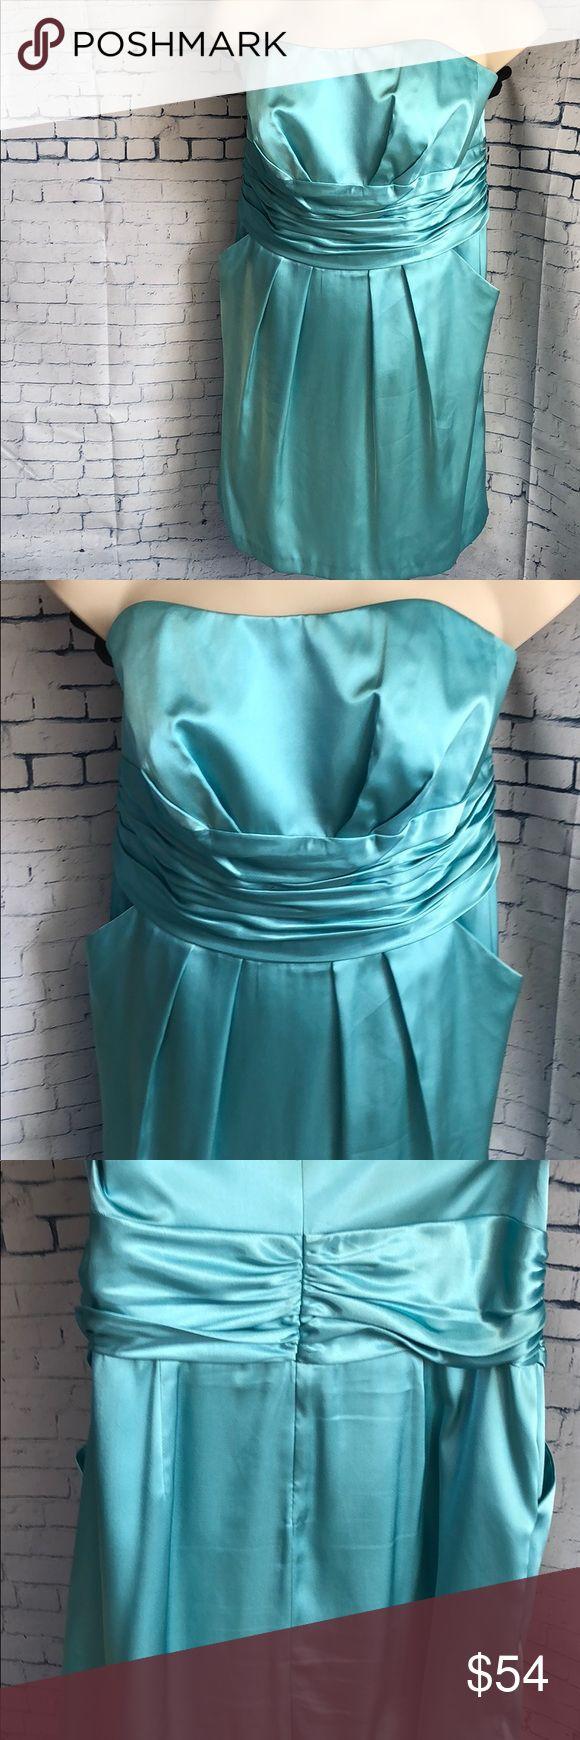 David's Bridal Aqua Bridesmaid Dress Like new Davids Bridal aqua polyester strapless bridesmaid dress.  A size 16 with details that make it figure flattering and side pockets for comfort. Davids Bridal Dresses Prom